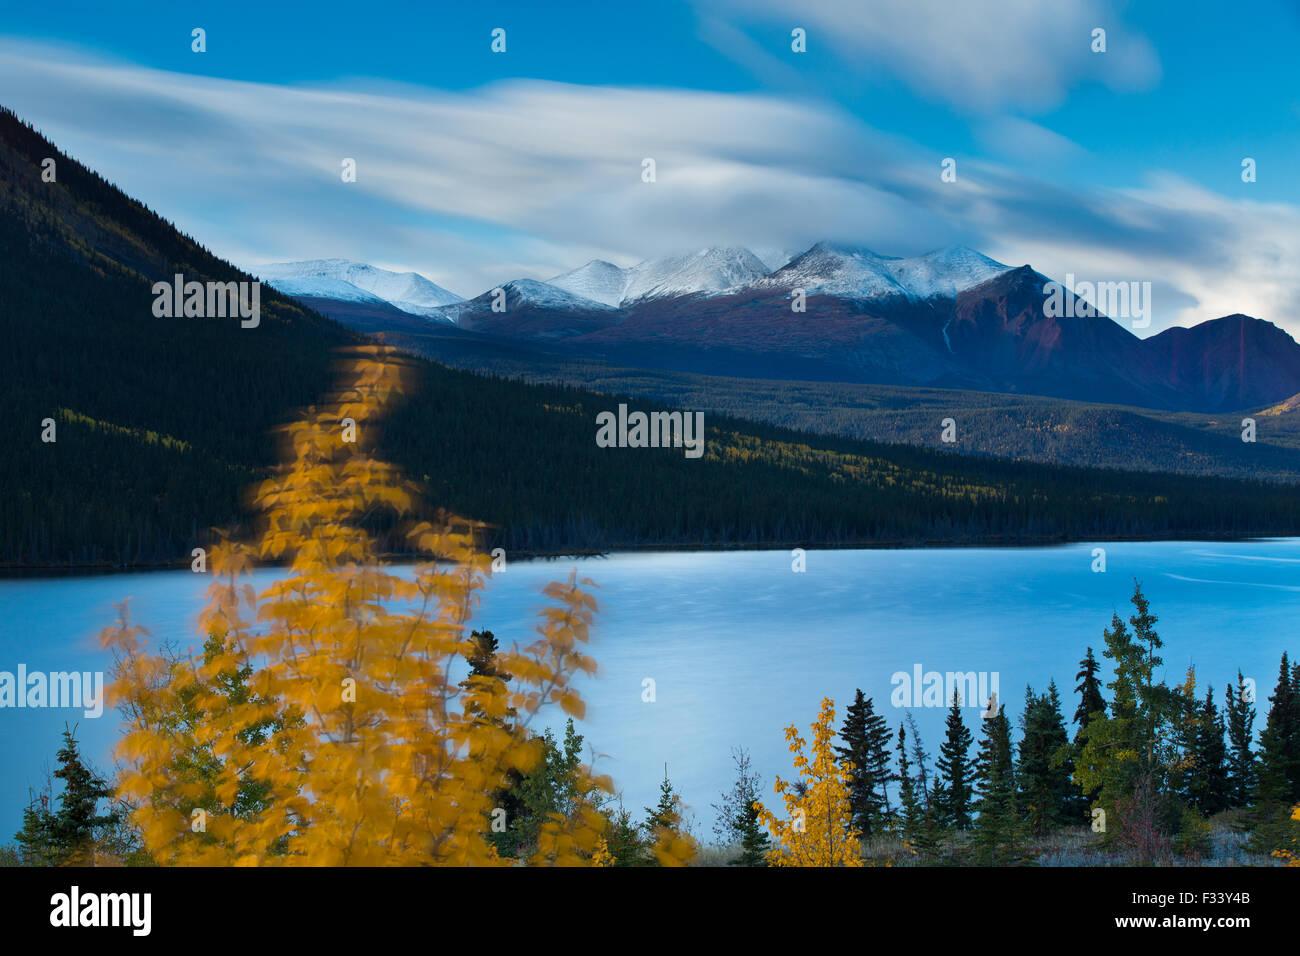 Herbstfärbung bei Nares Lake mit Montana Berg darüber hinaus, in der Nähe von Carcross, Yukon Territorien, Stockbild